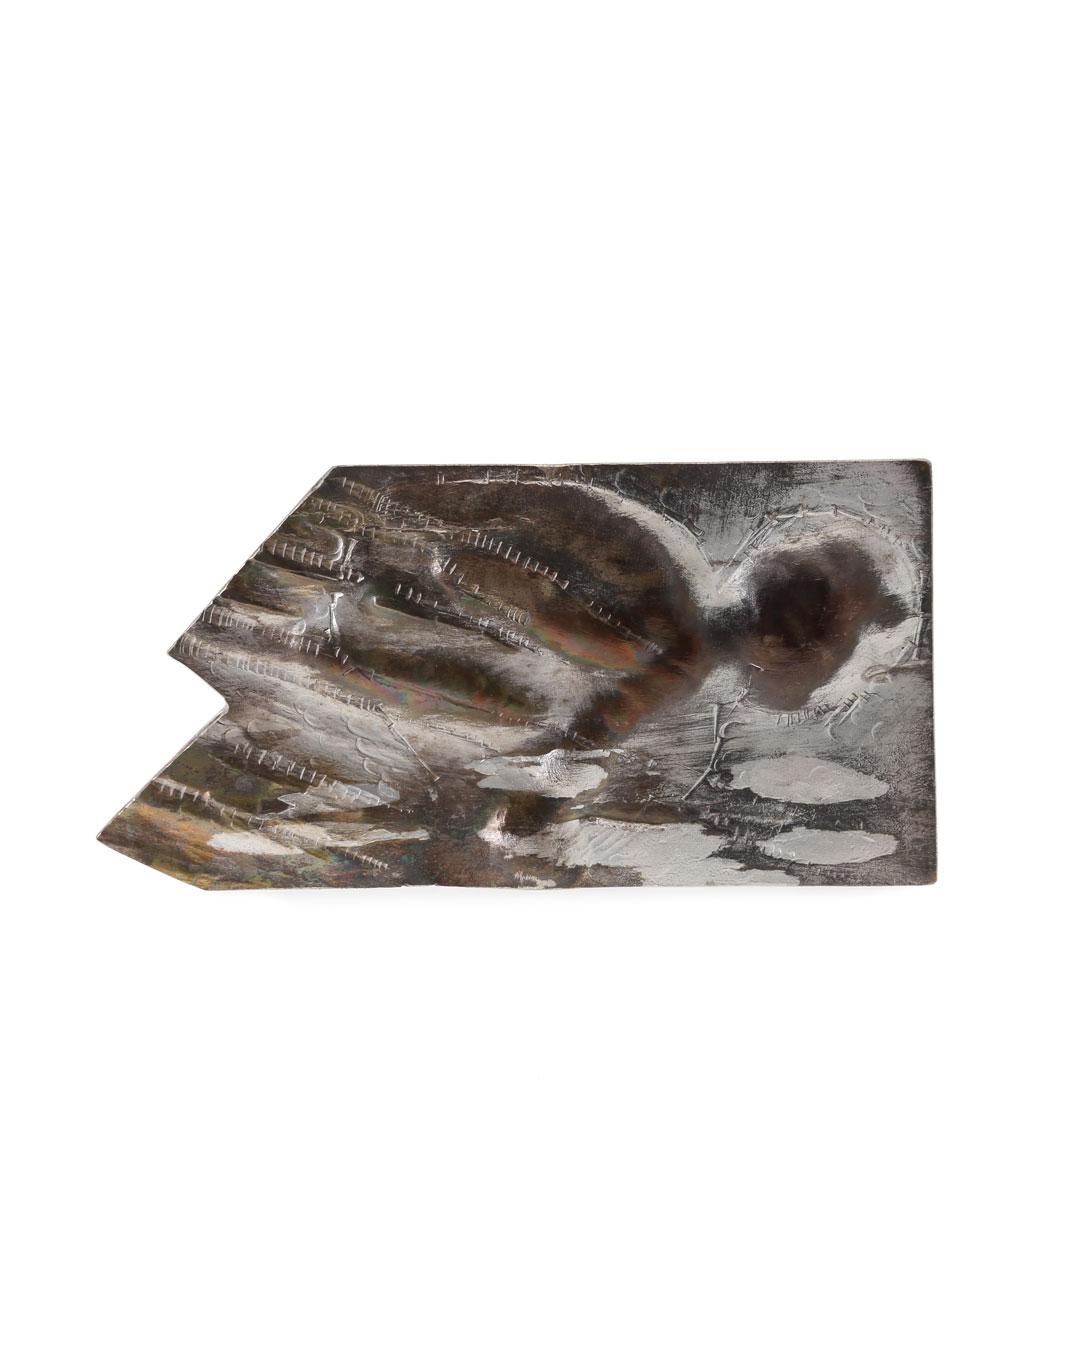 Rudolf Kocéa, Der Sprung (The Leap), 2017, brooch, silver, copper, 130 x 70 x 8 mm, €2400